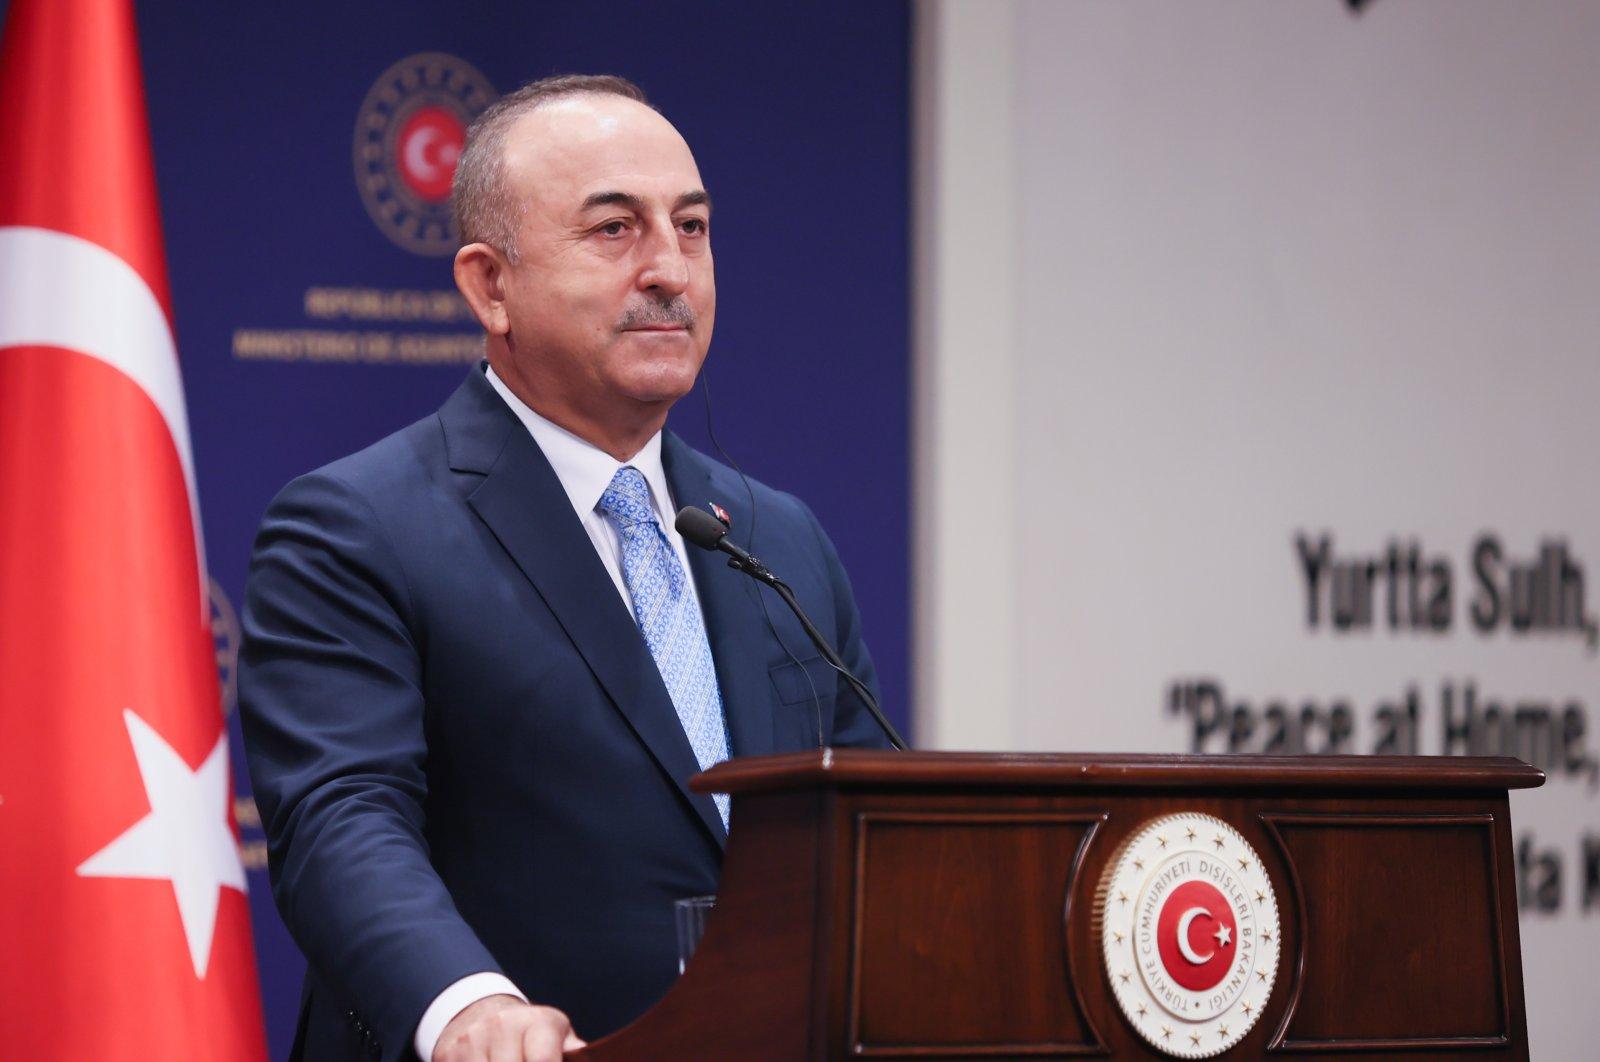 Foreign Minister Mevlüt Çavuşoğlu listens during a press conference in Ankara, Turkey, Aug. 24, 2021. (AA Photo)